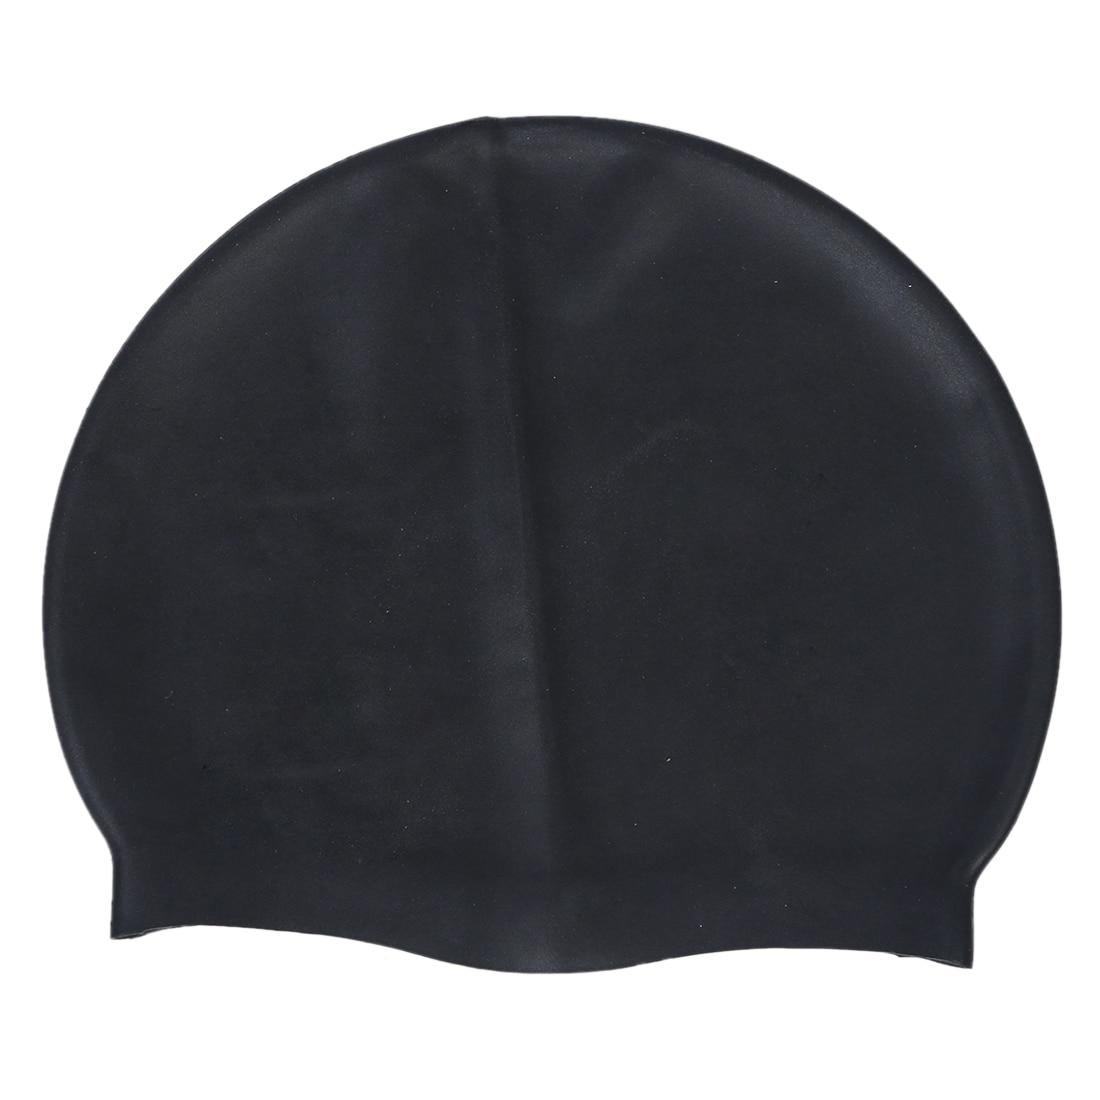 80bc64c523b 2019 Black Soft Silicone Stretchable Swim Swimming Cap Hat For ...